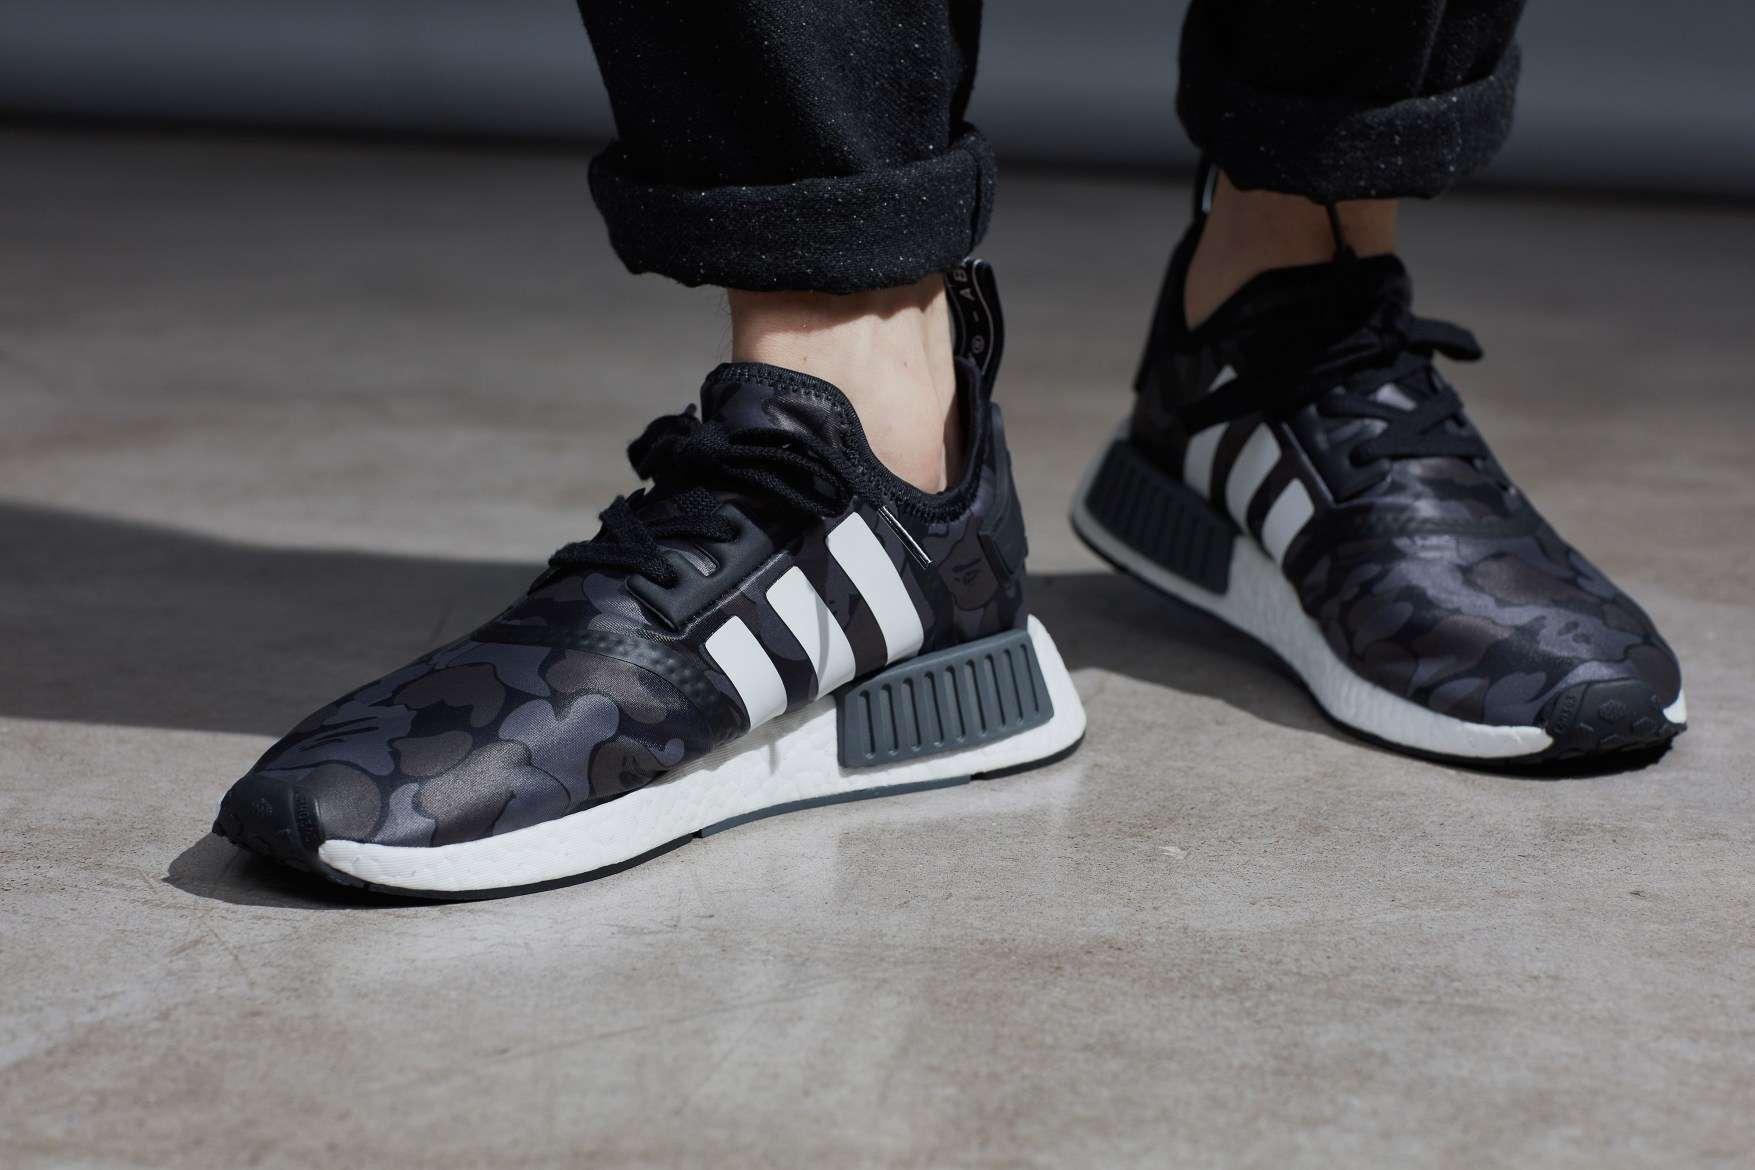 bape adidas originals deutschland release infos 04